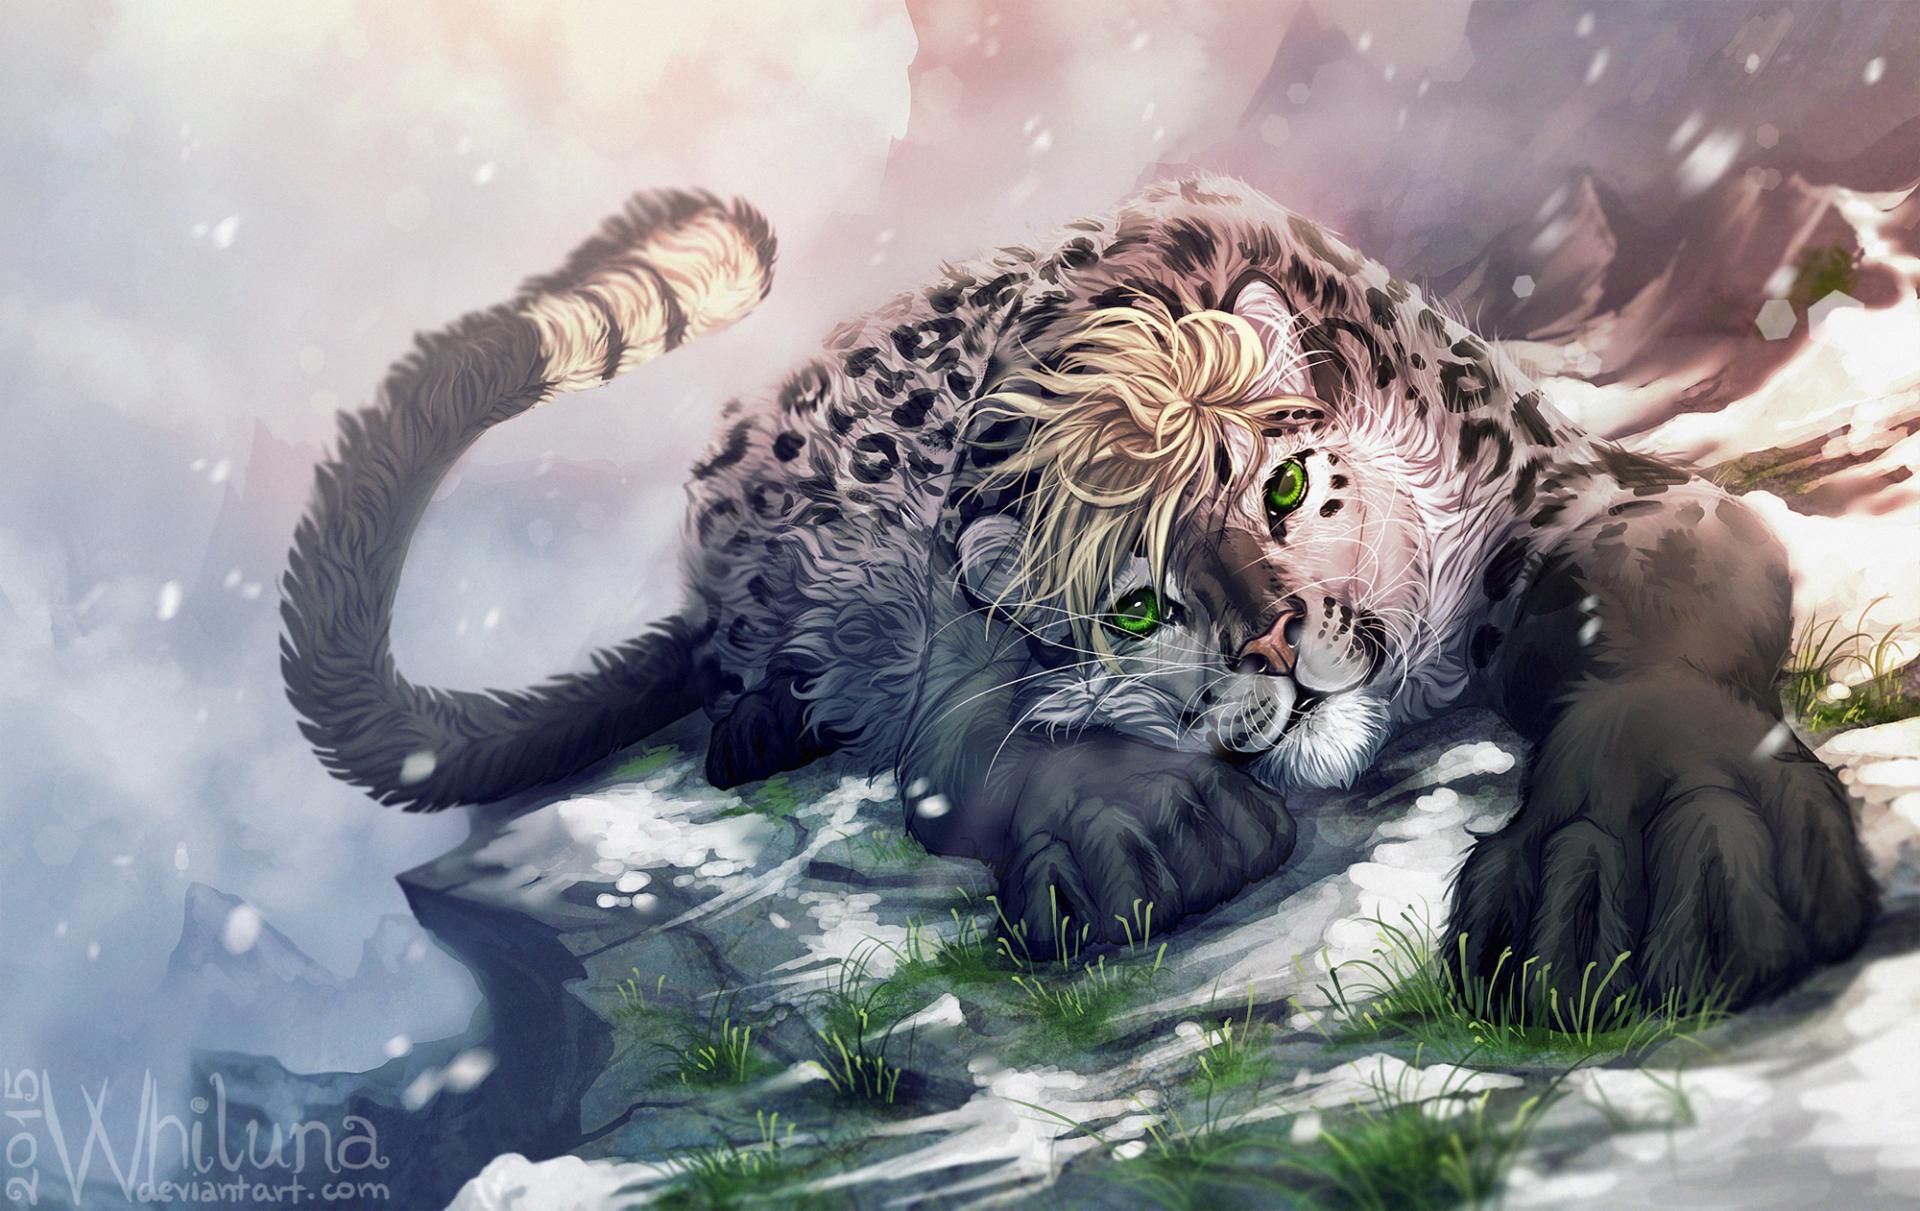 Free Download Wallpaper Anime Girl Fantasy Animals Wallpaper Hd Download